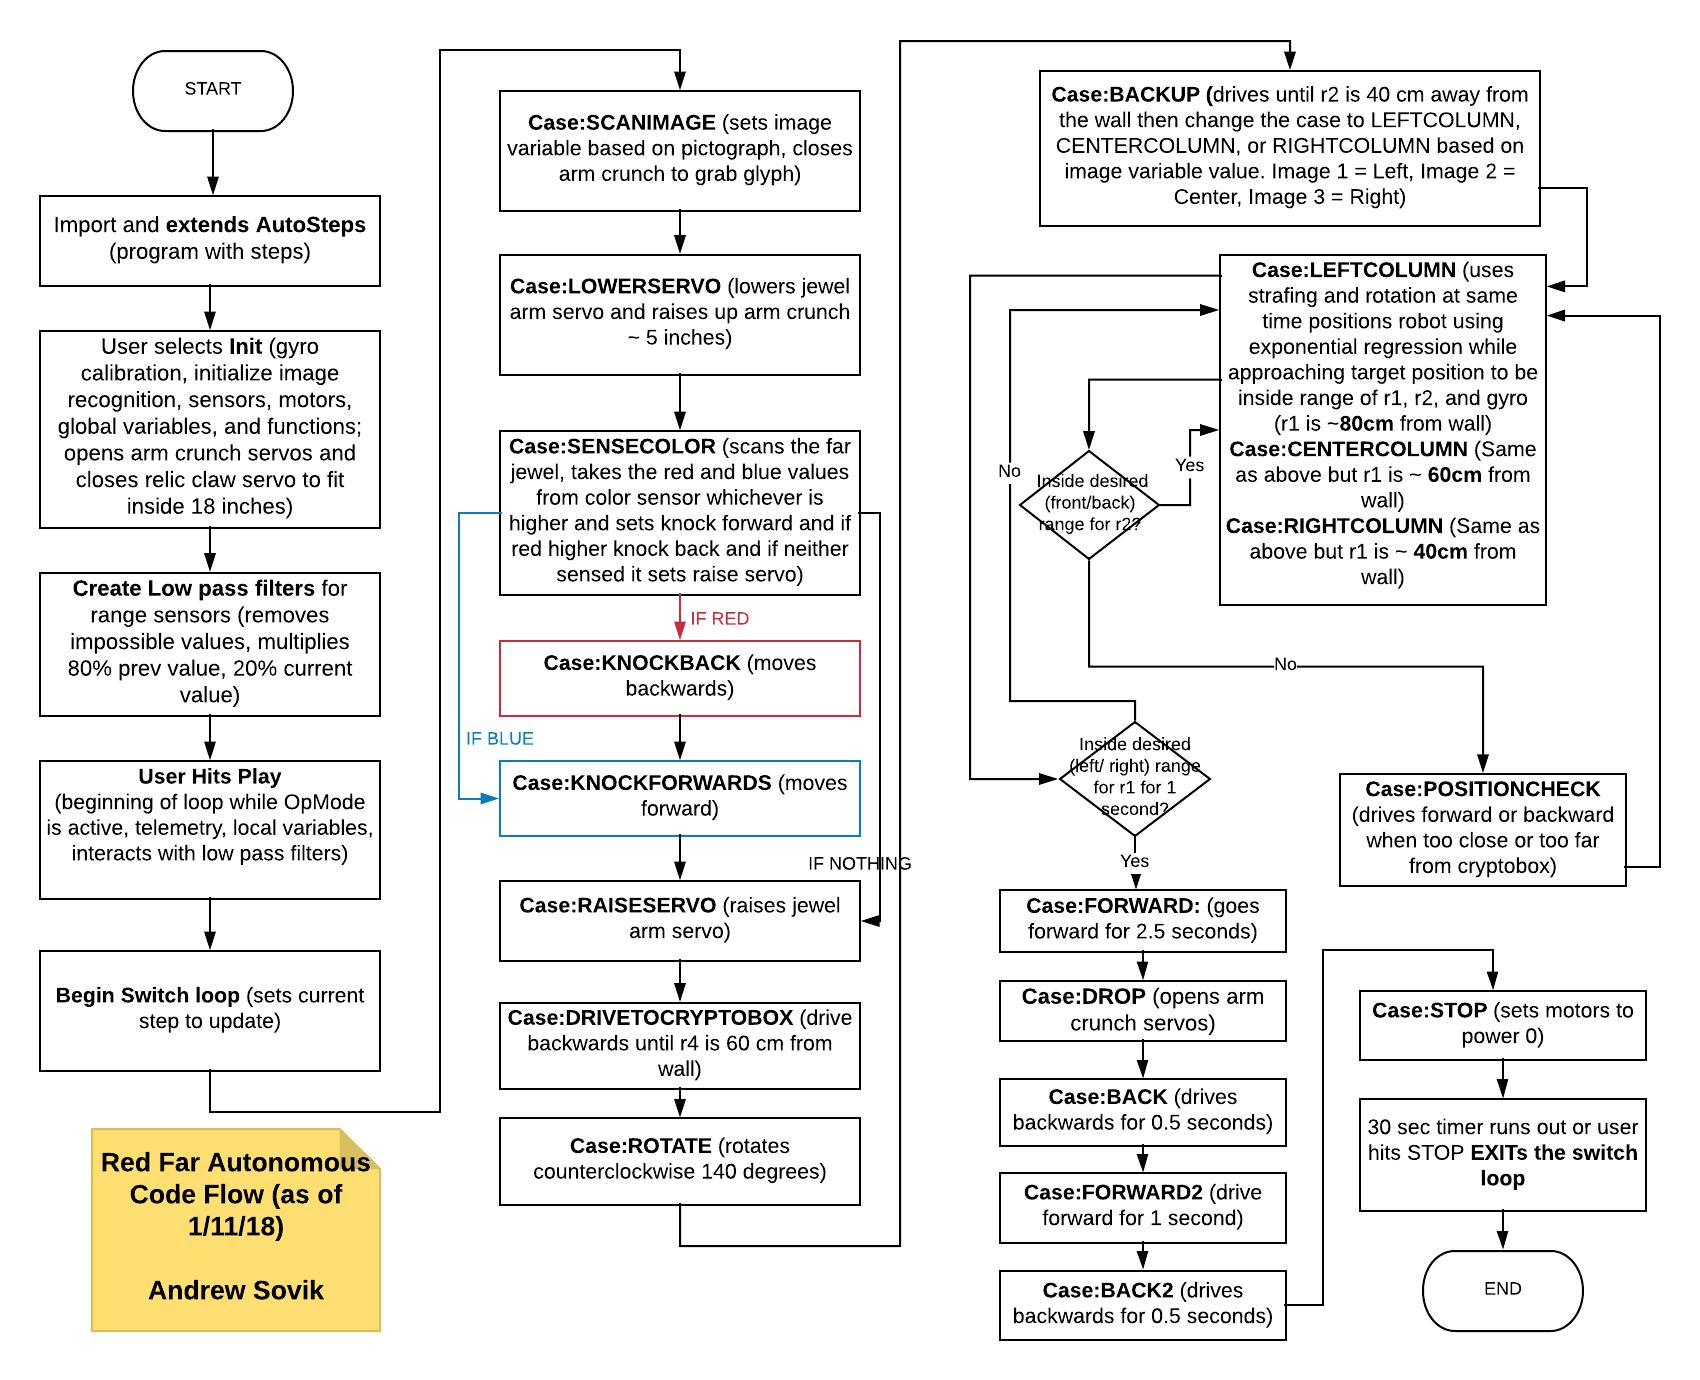 complete diagram explaining robot's control